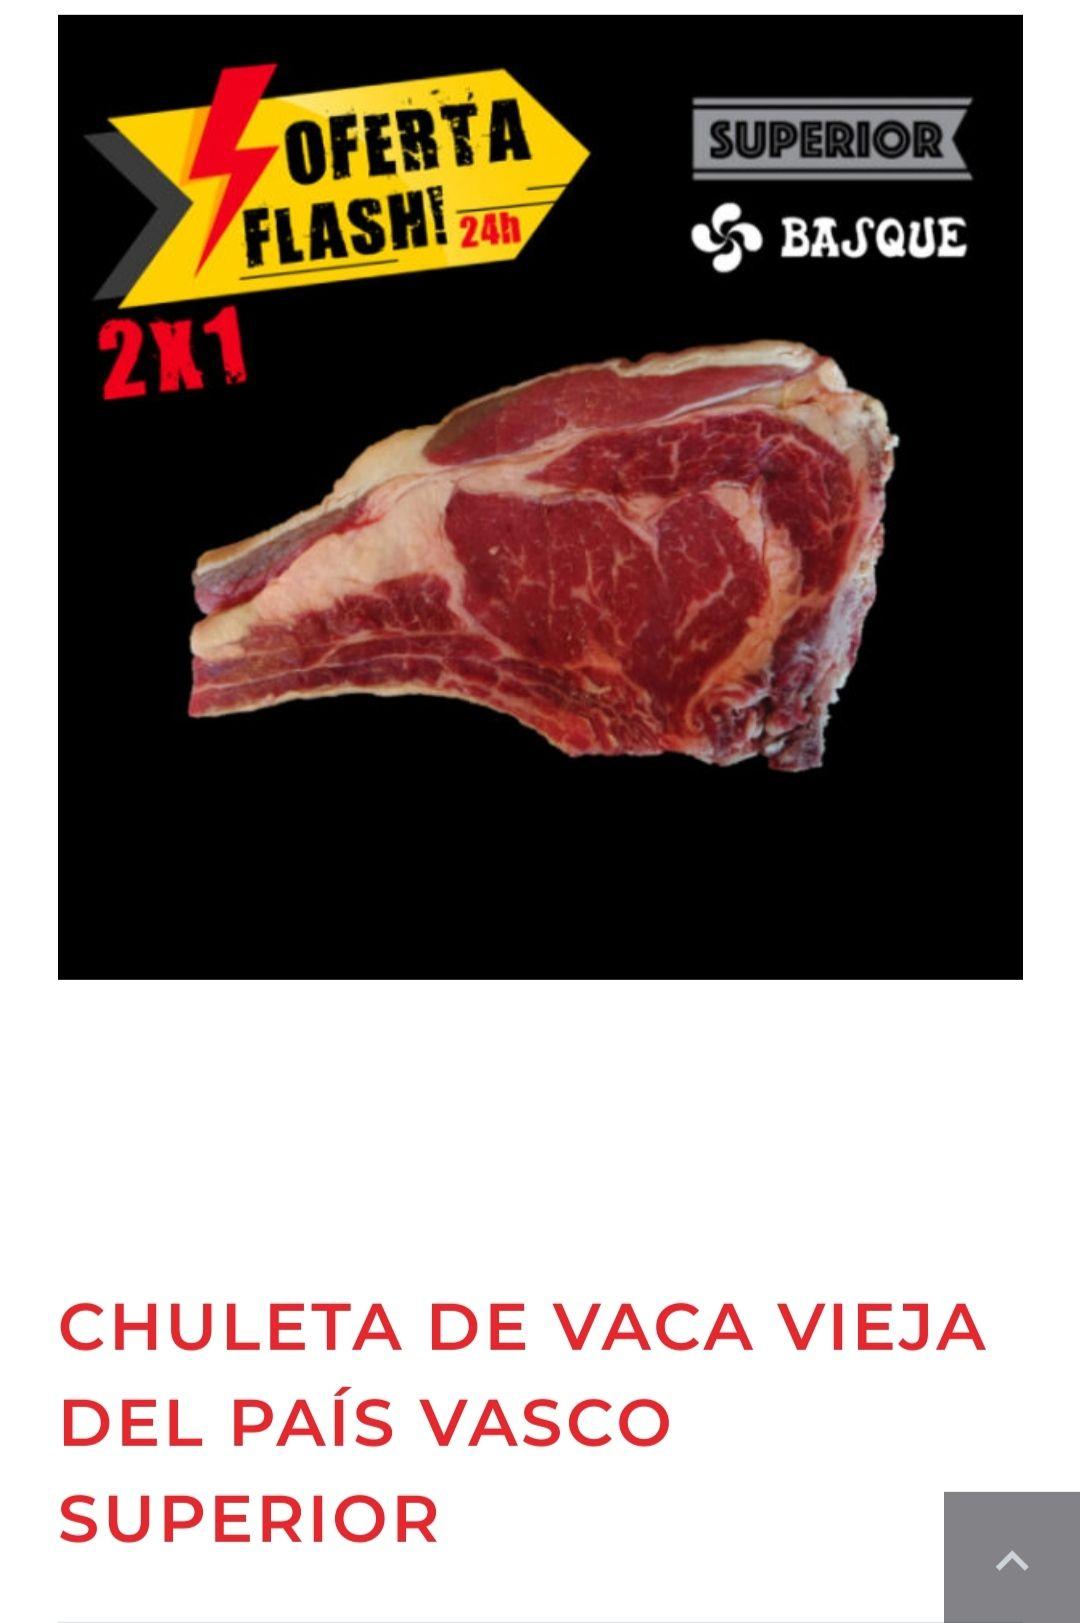 Chuletón de vaca vieja del País Vasco